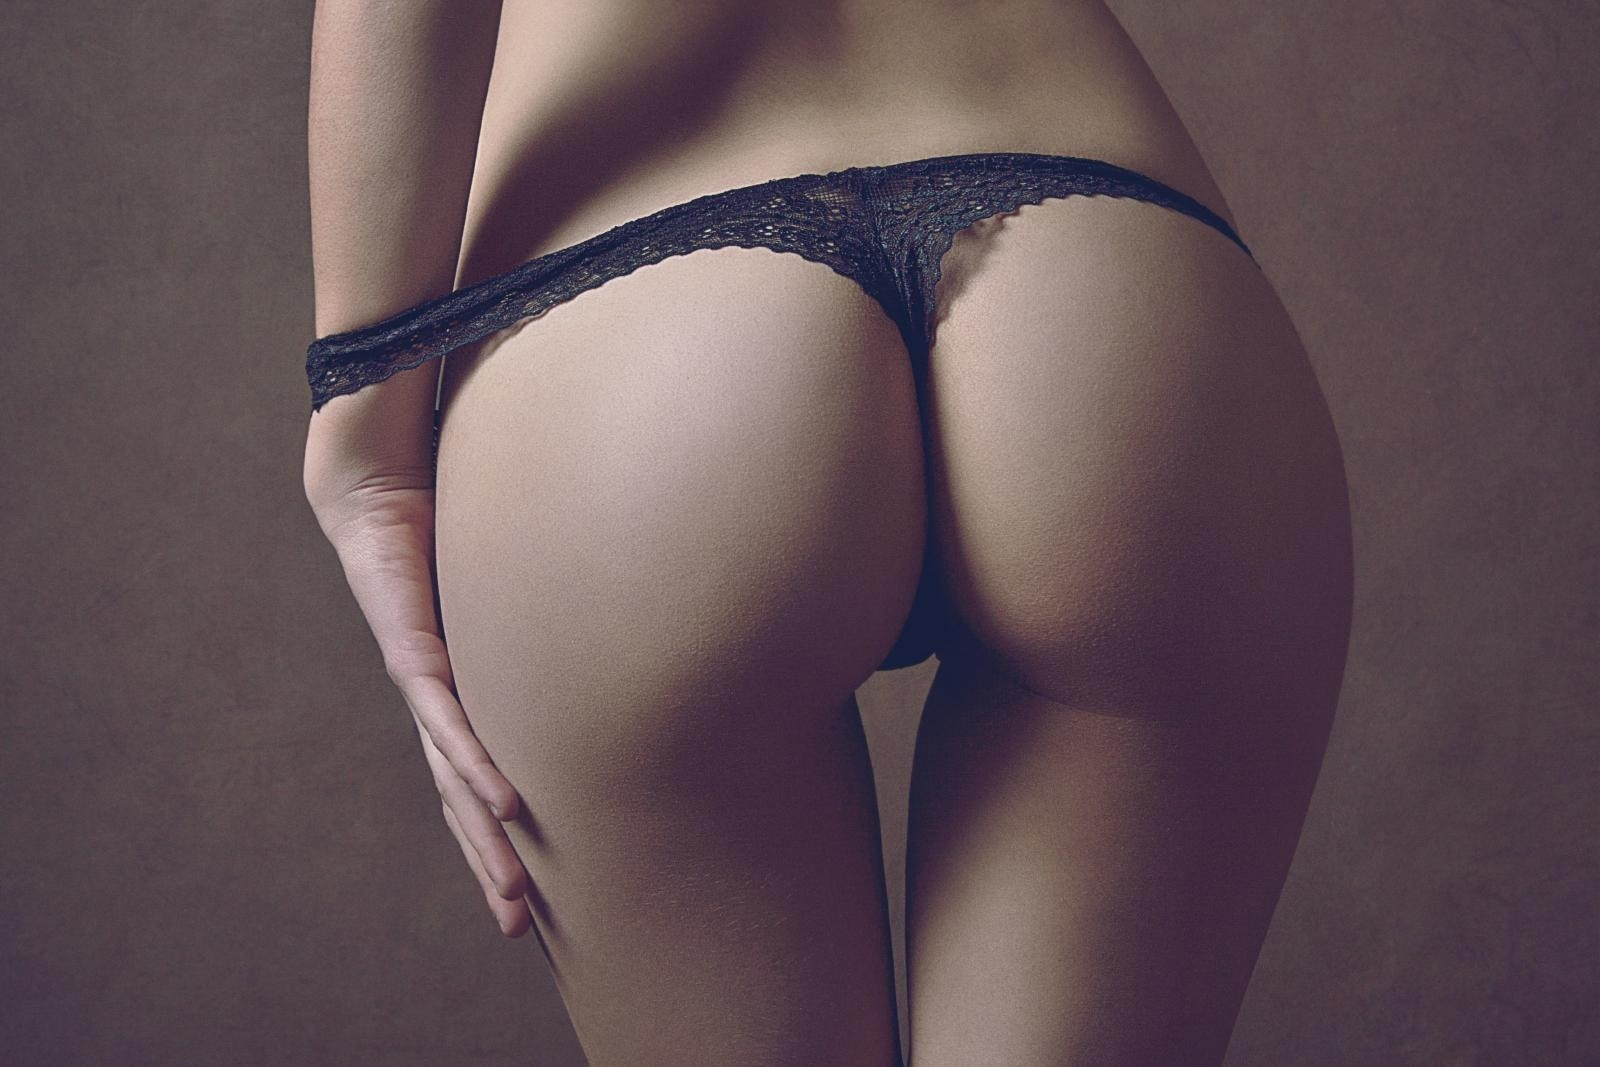 People 1600x1067 women panties ass thong black panties black thong lingerie underwear